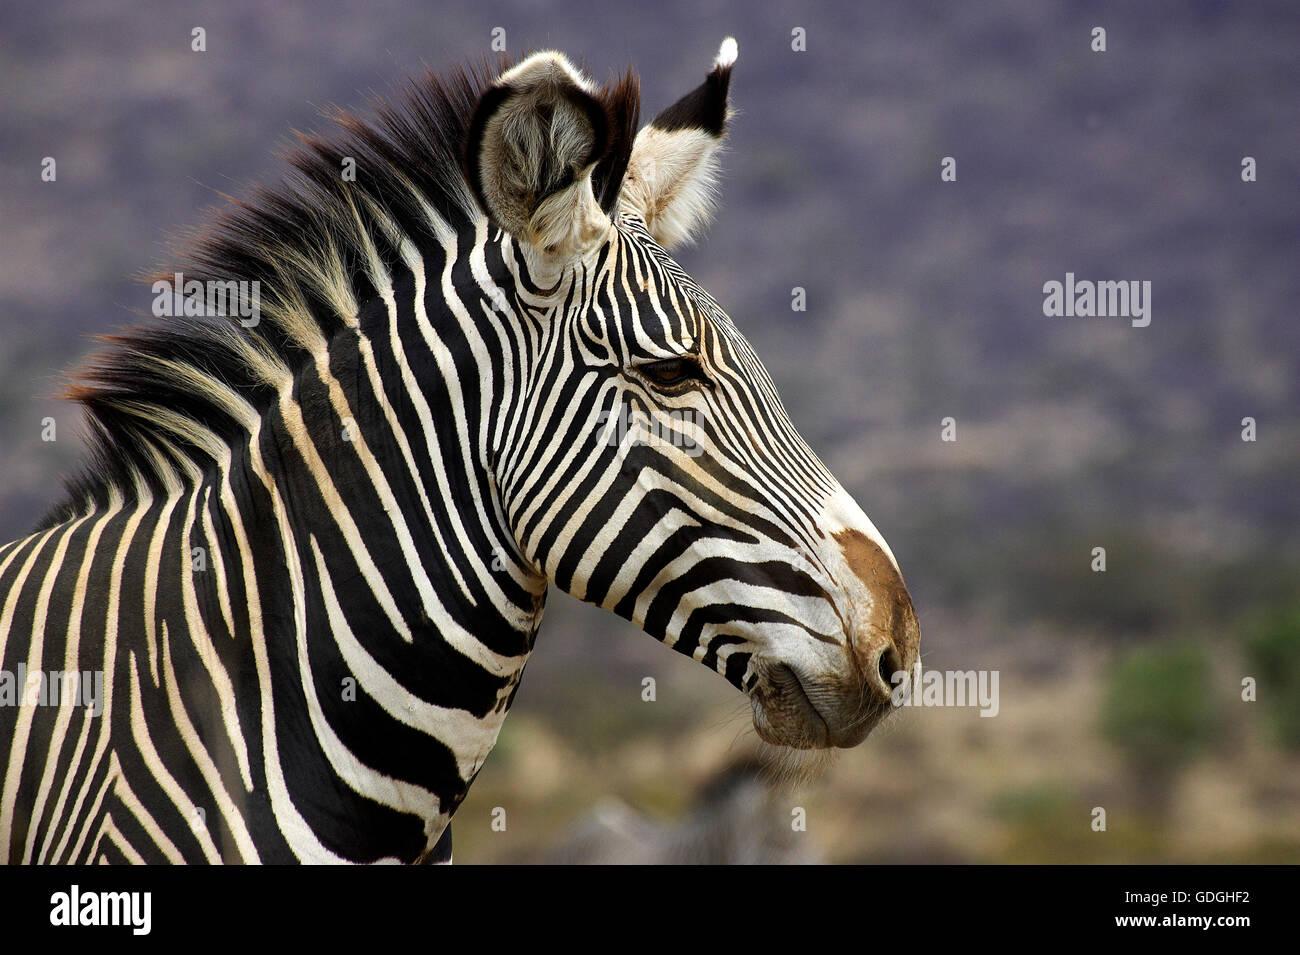 Grevy's Zebra, equus grevyi, Portrait of Adult, Samburu Park in Kenya Stock Photo